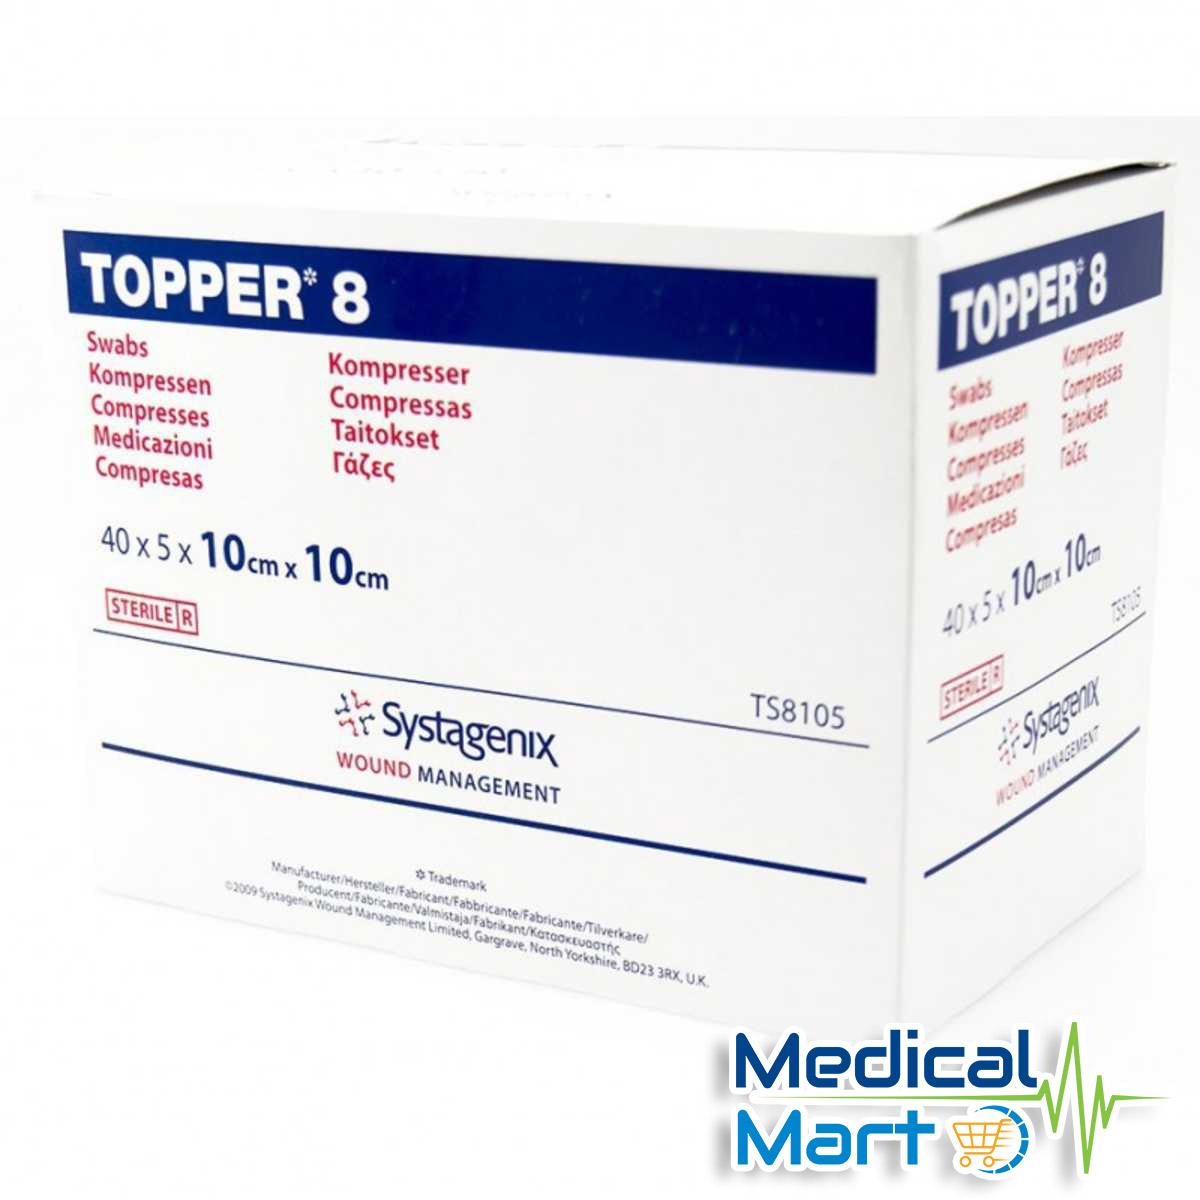 Topper 8 Sterile Gauze Swabs